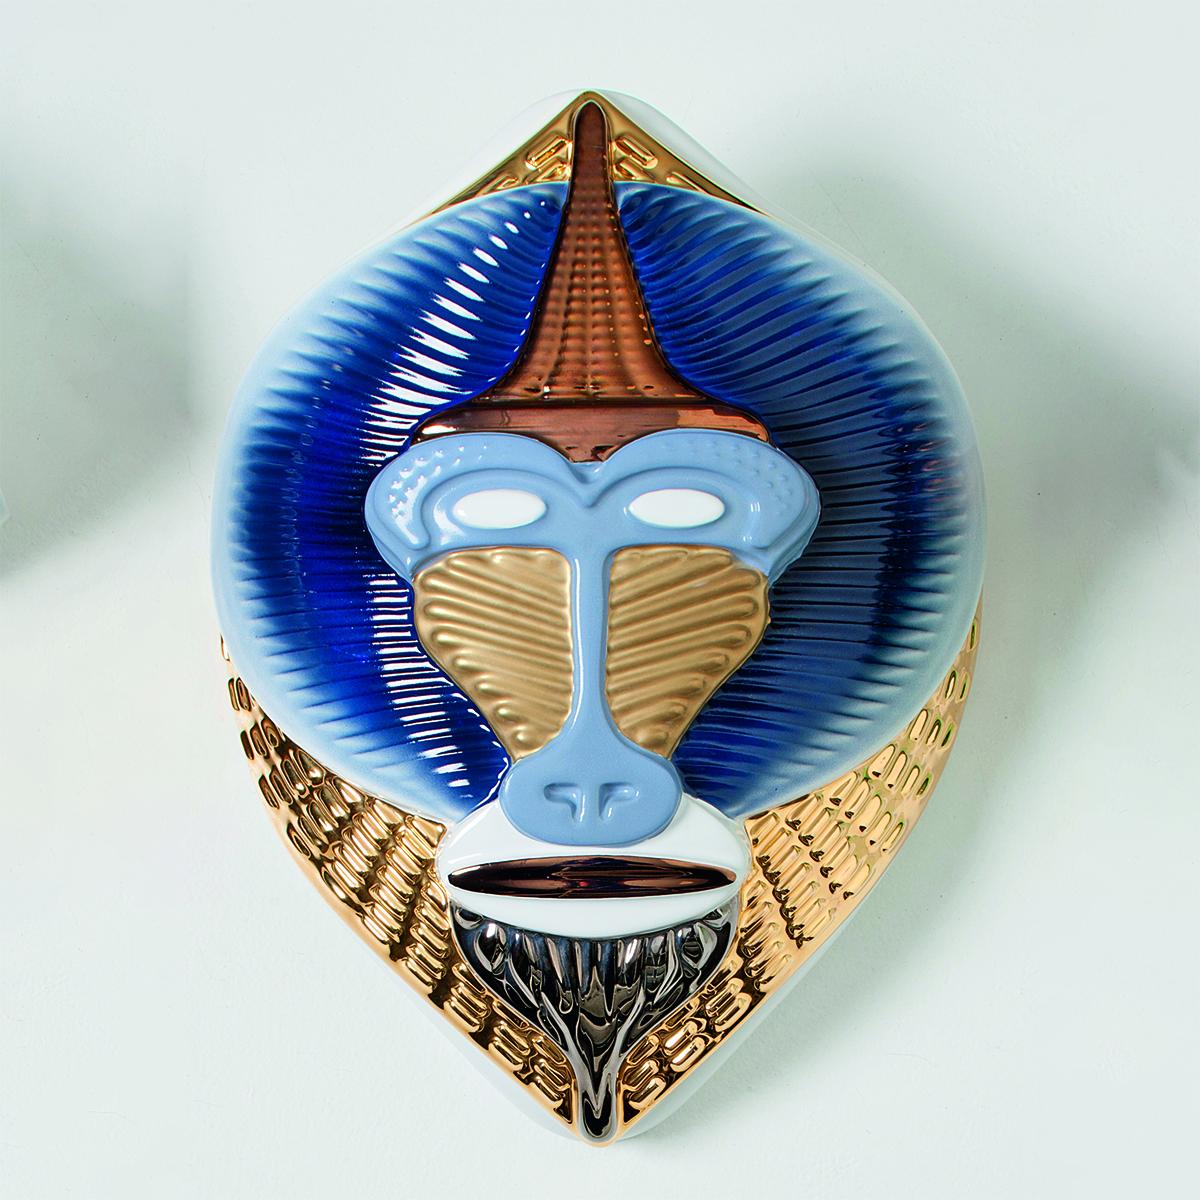 Maske Mandrillus Hvit/Blå